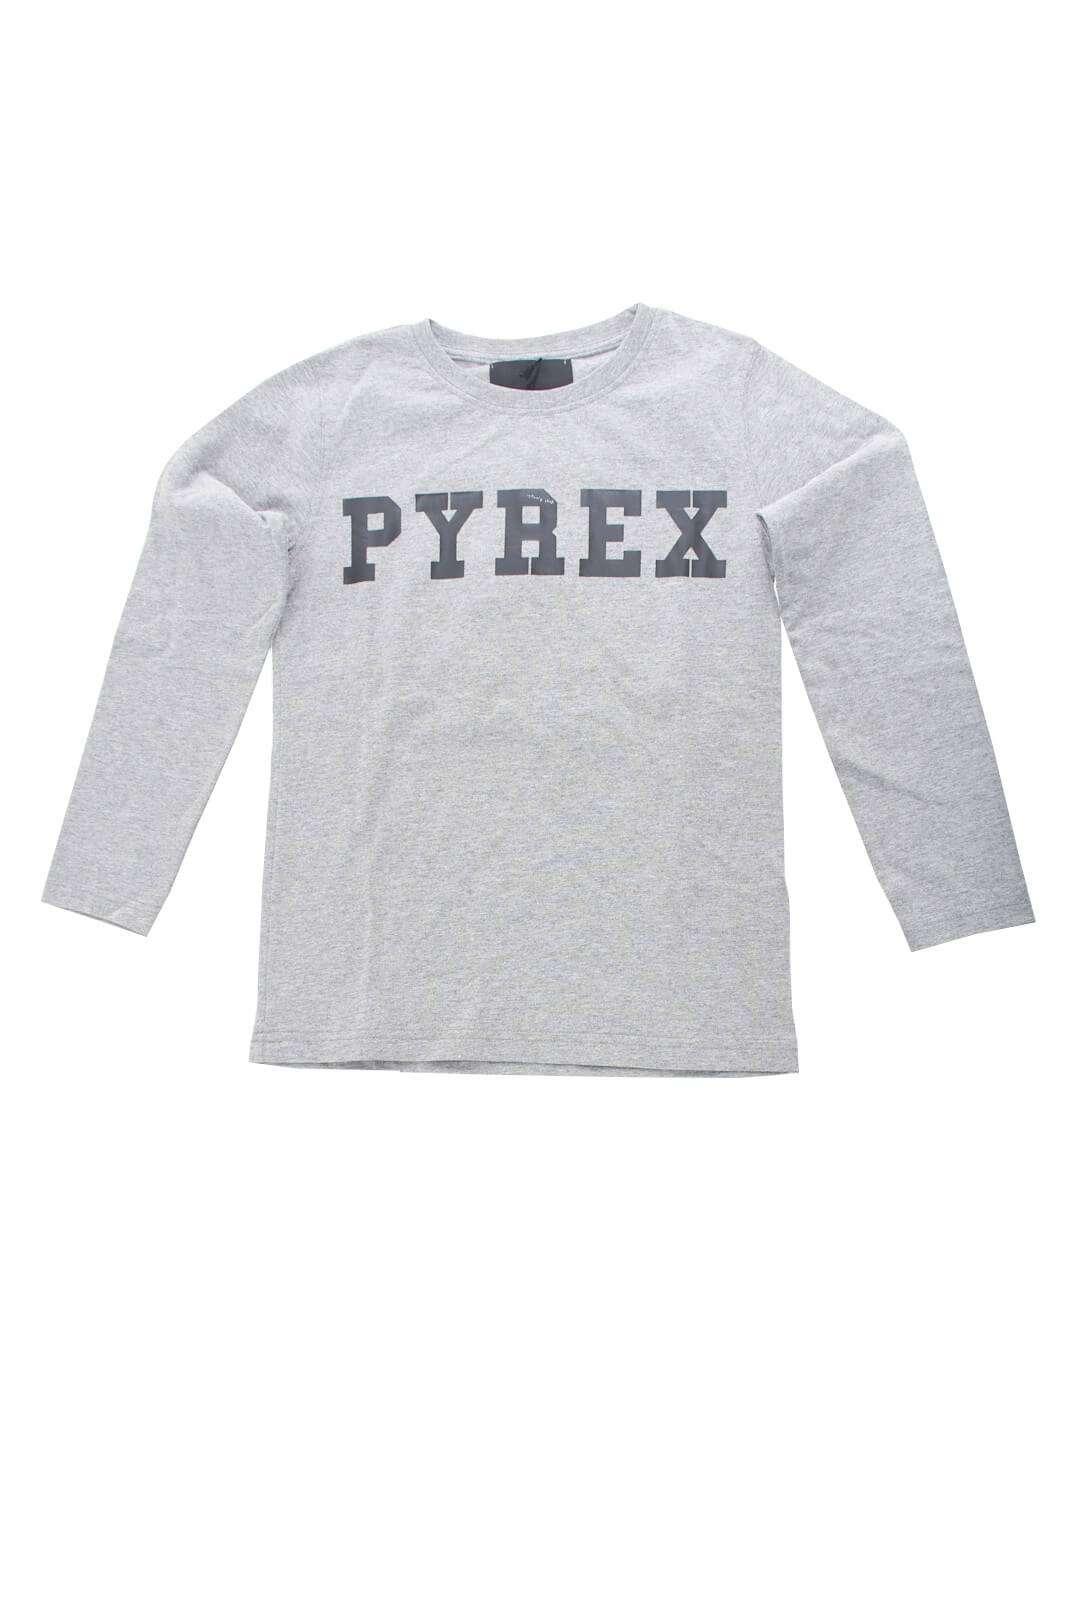 AI outlet parmax tshirt bambino pyrex 008575 A